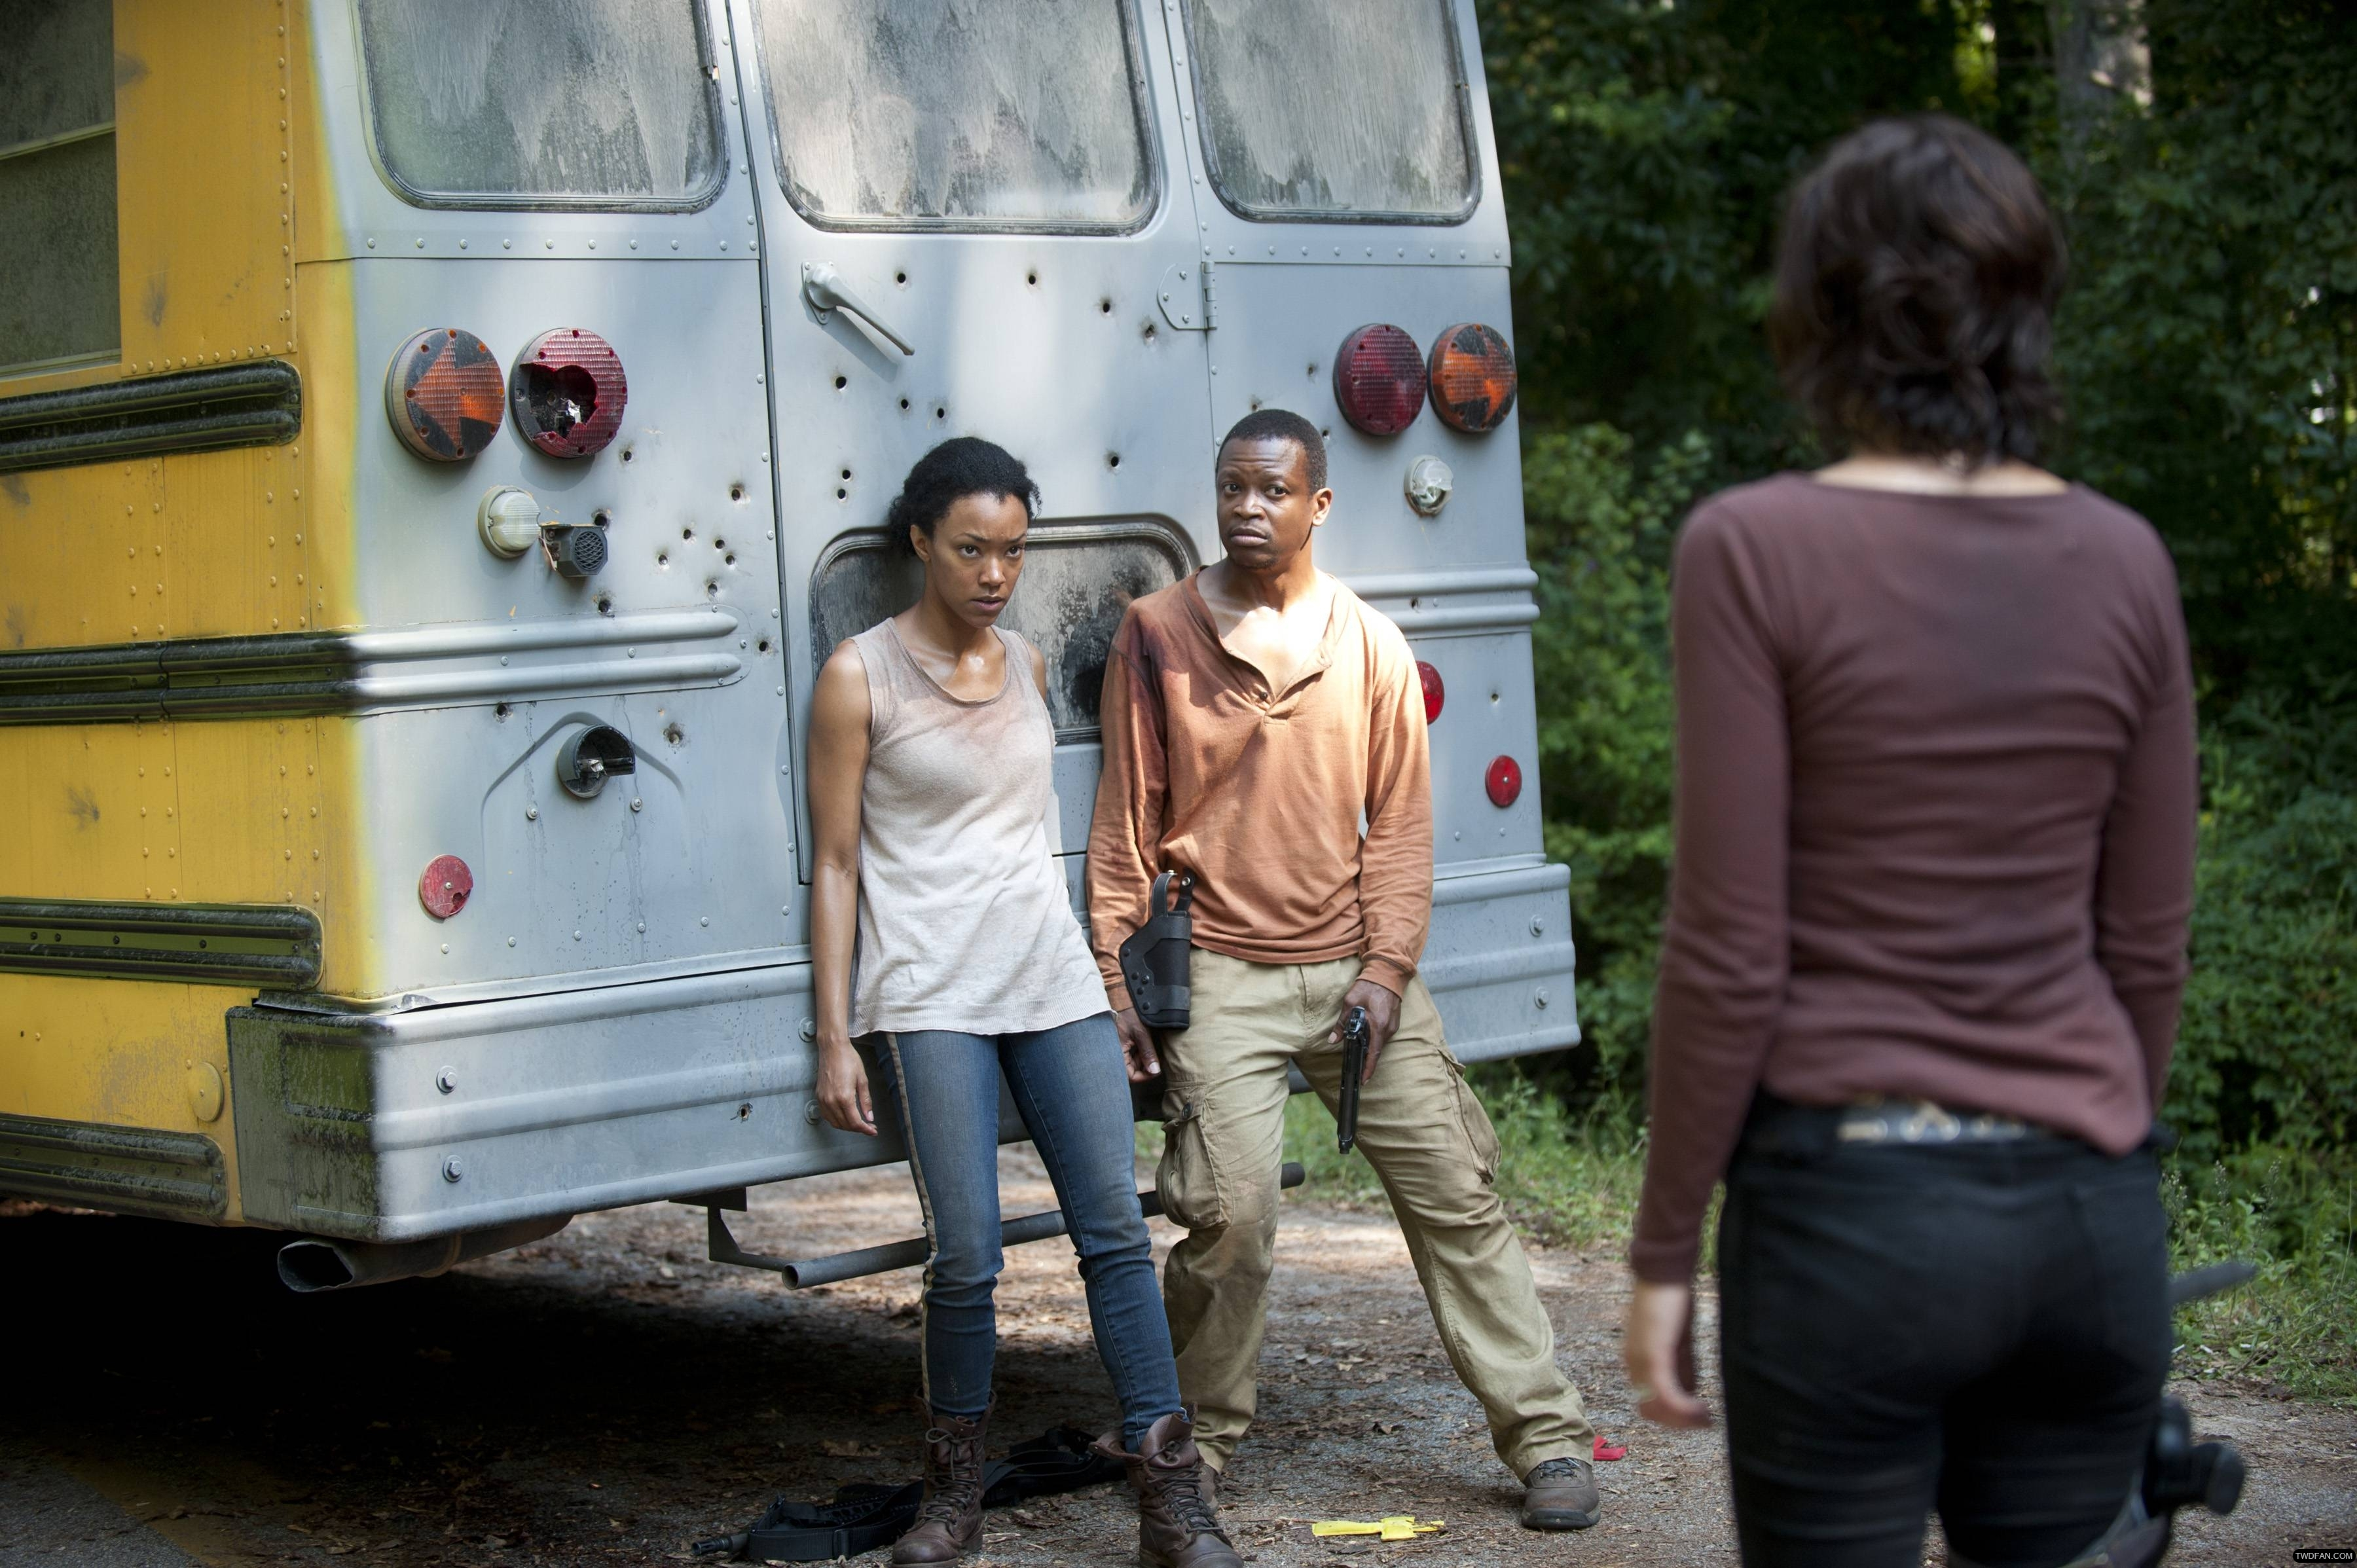 The-Walking-Dead-4-Temporada-S04E10-Inmates-HQ-044